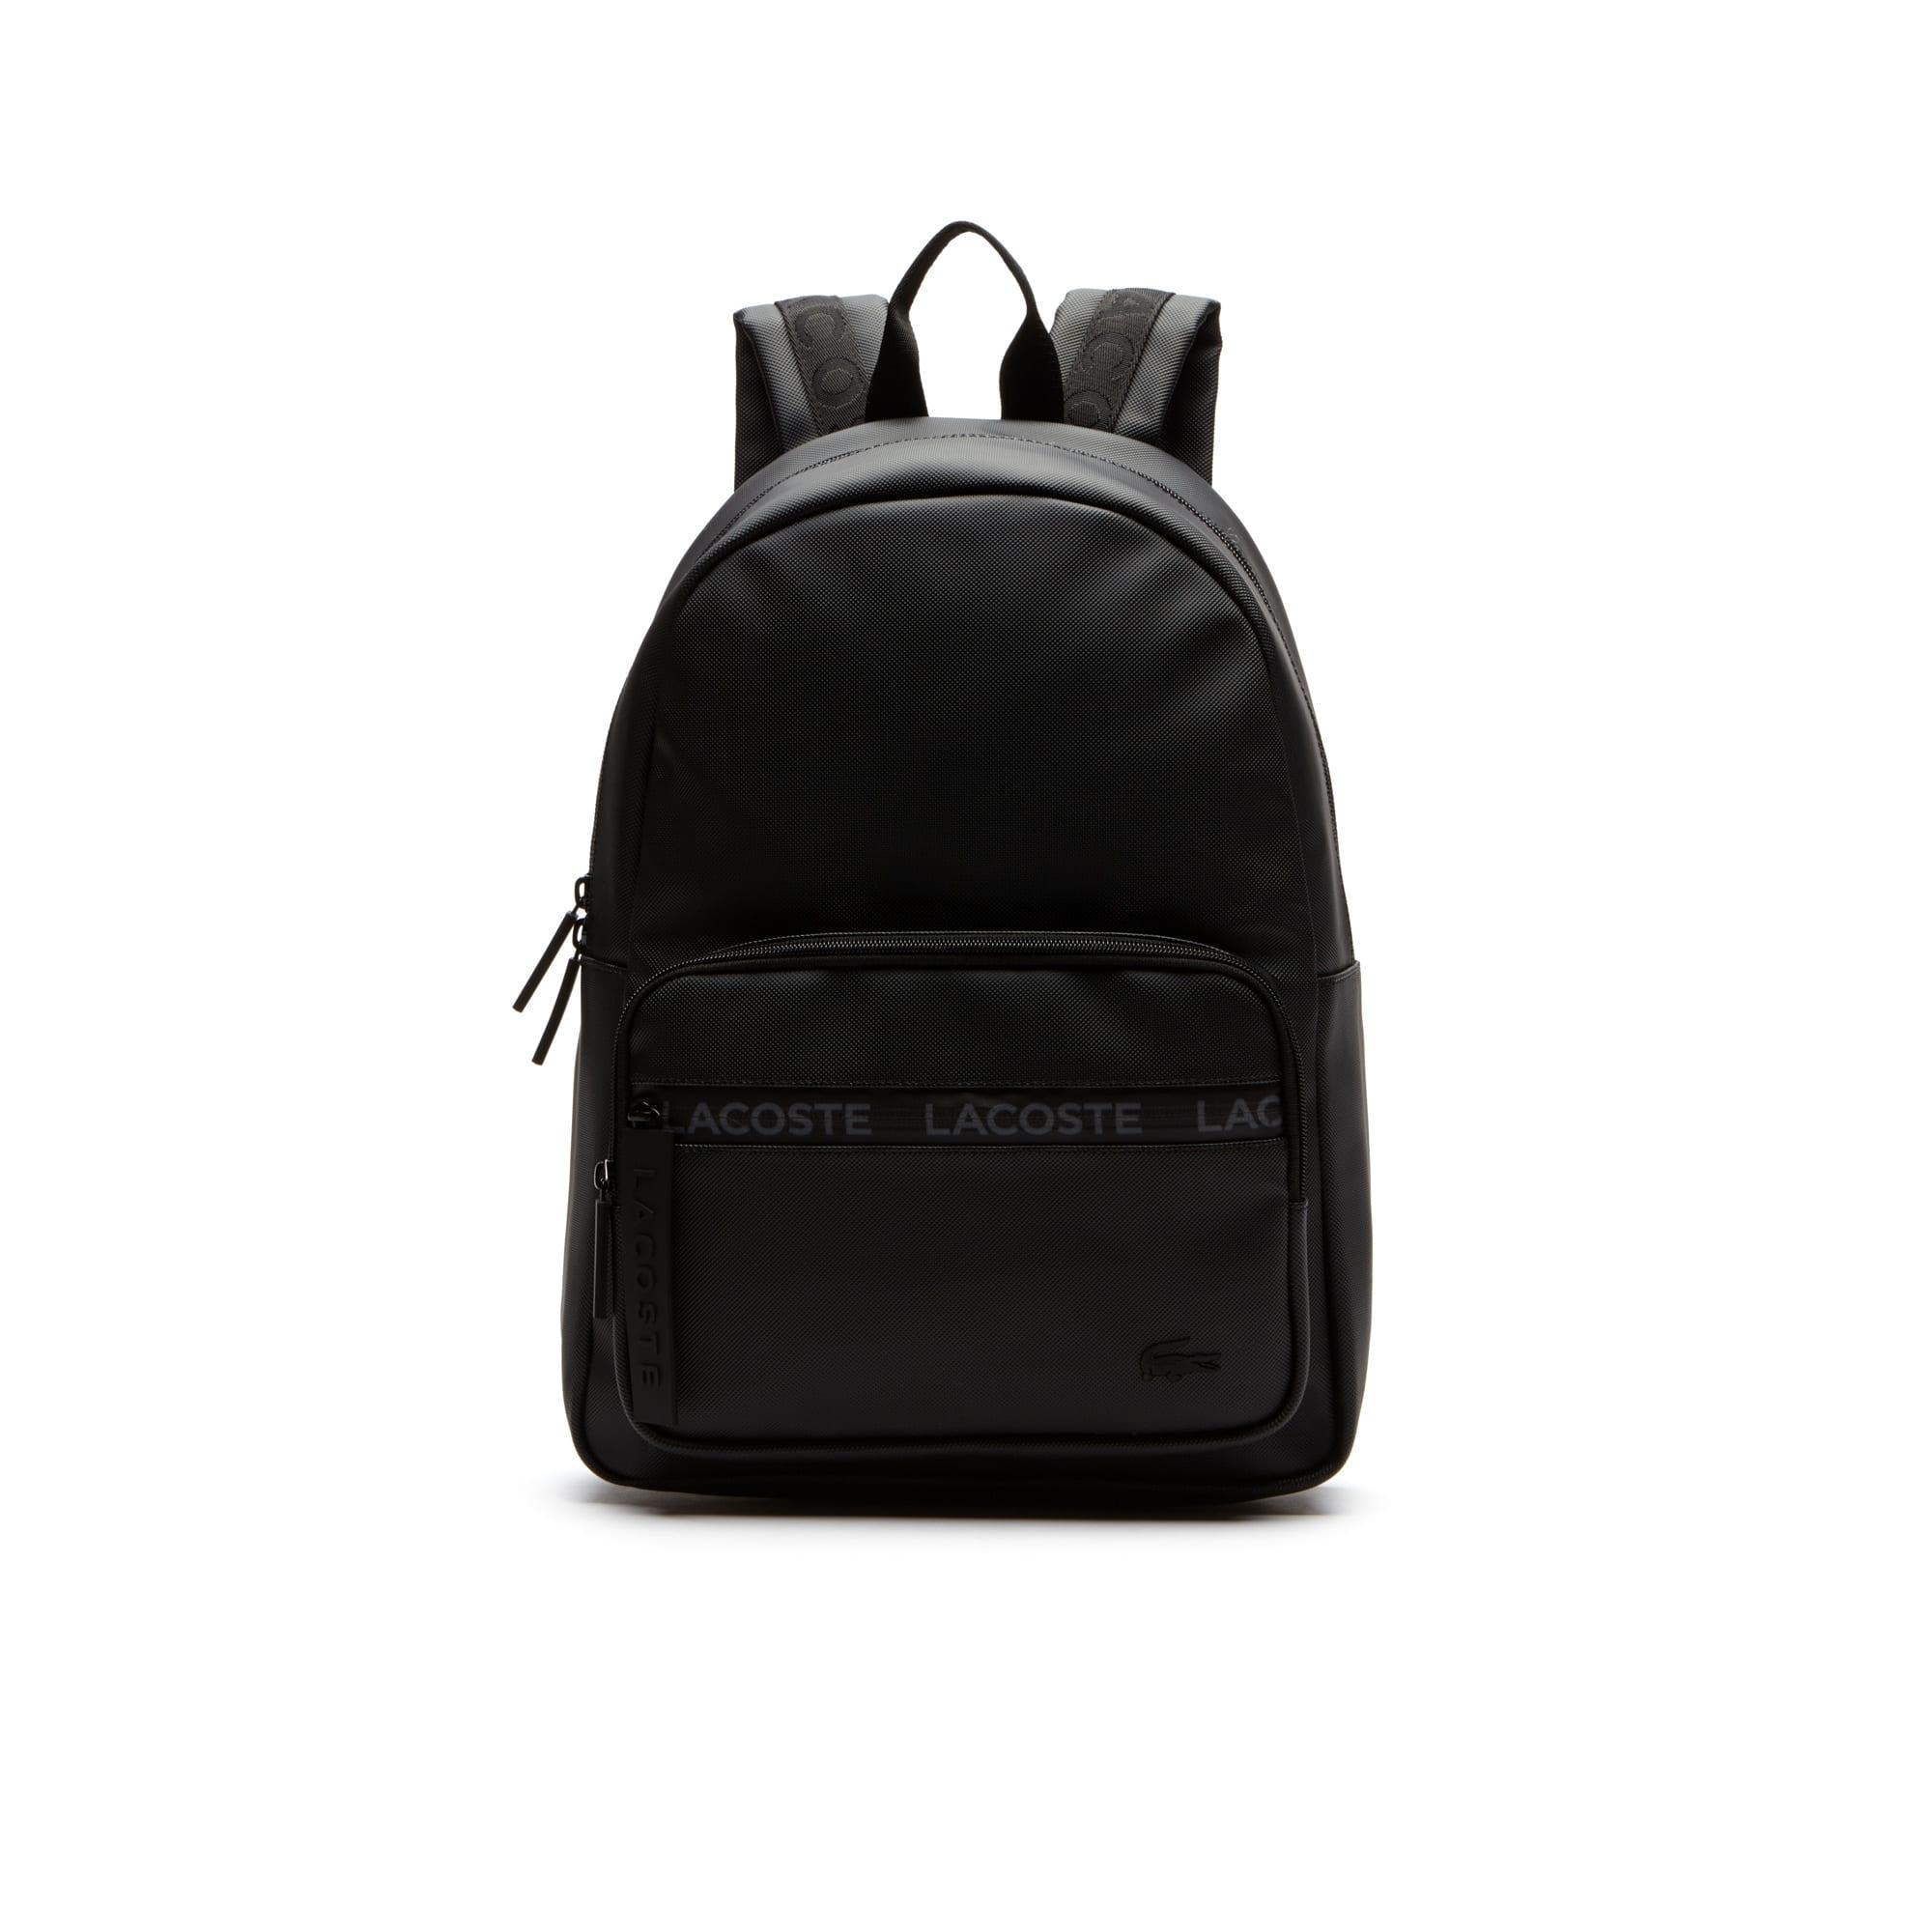 Men's L.12.12 Concept Lacoste Lettering Backpack